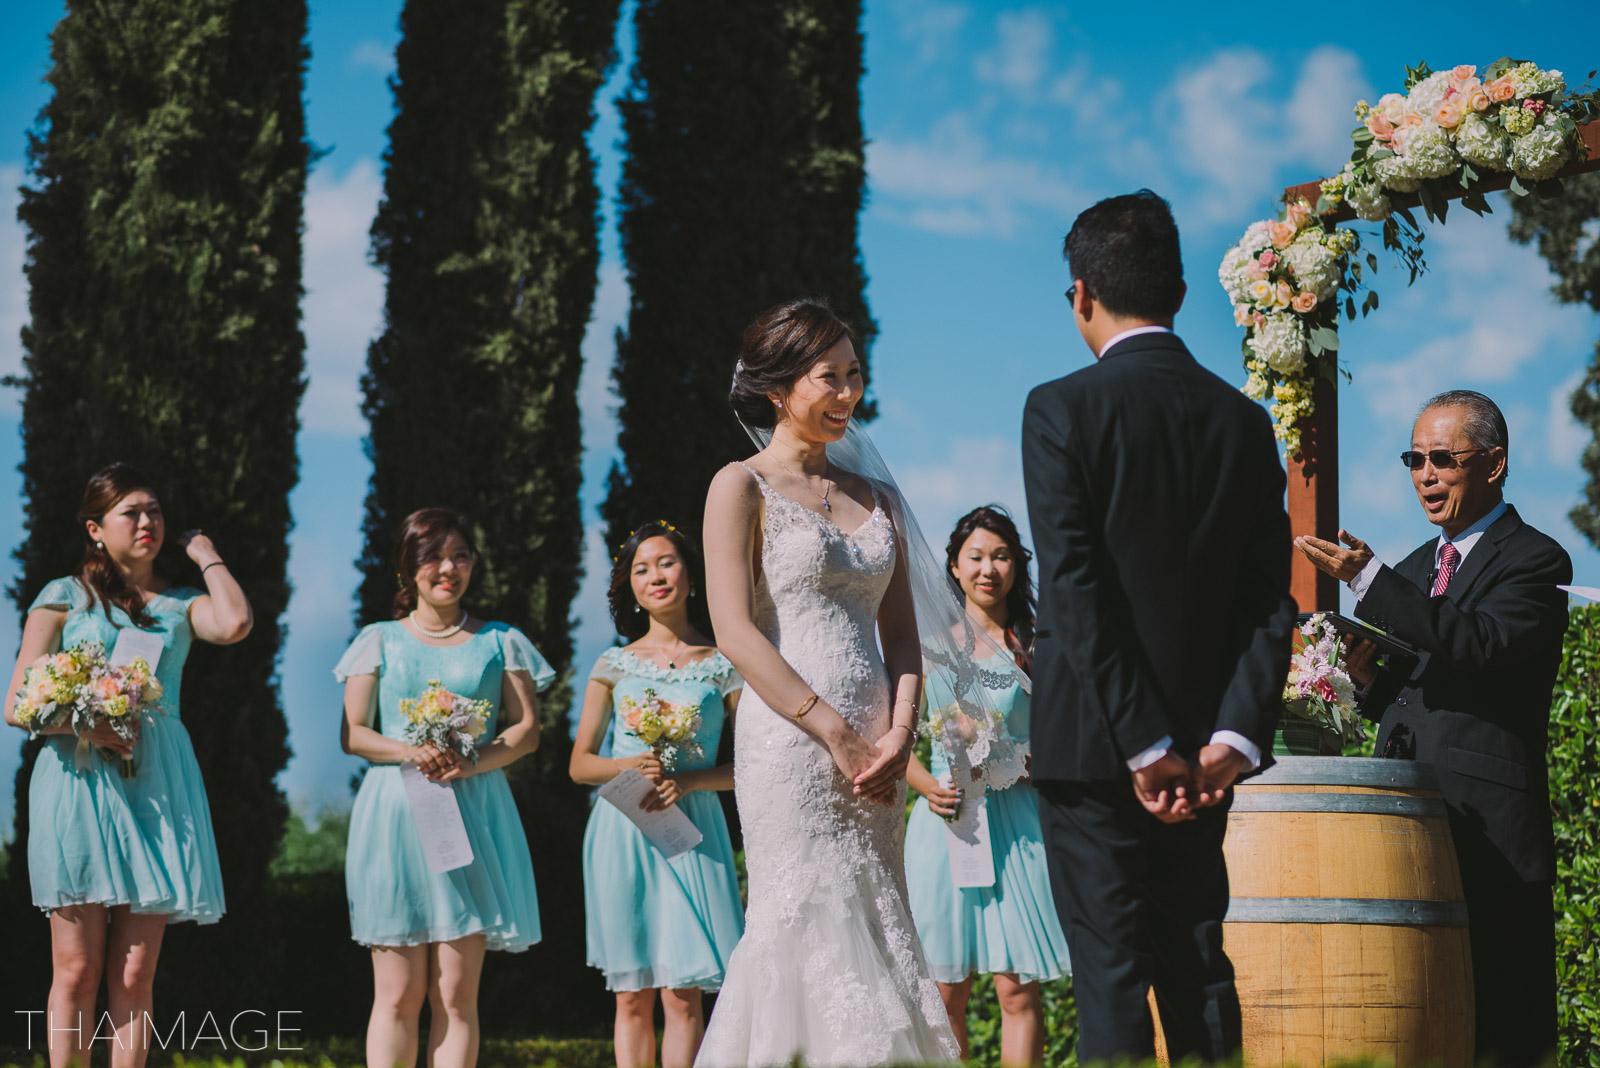 00067-20160612- JuneEdmond-Chung-Wedding.jpg